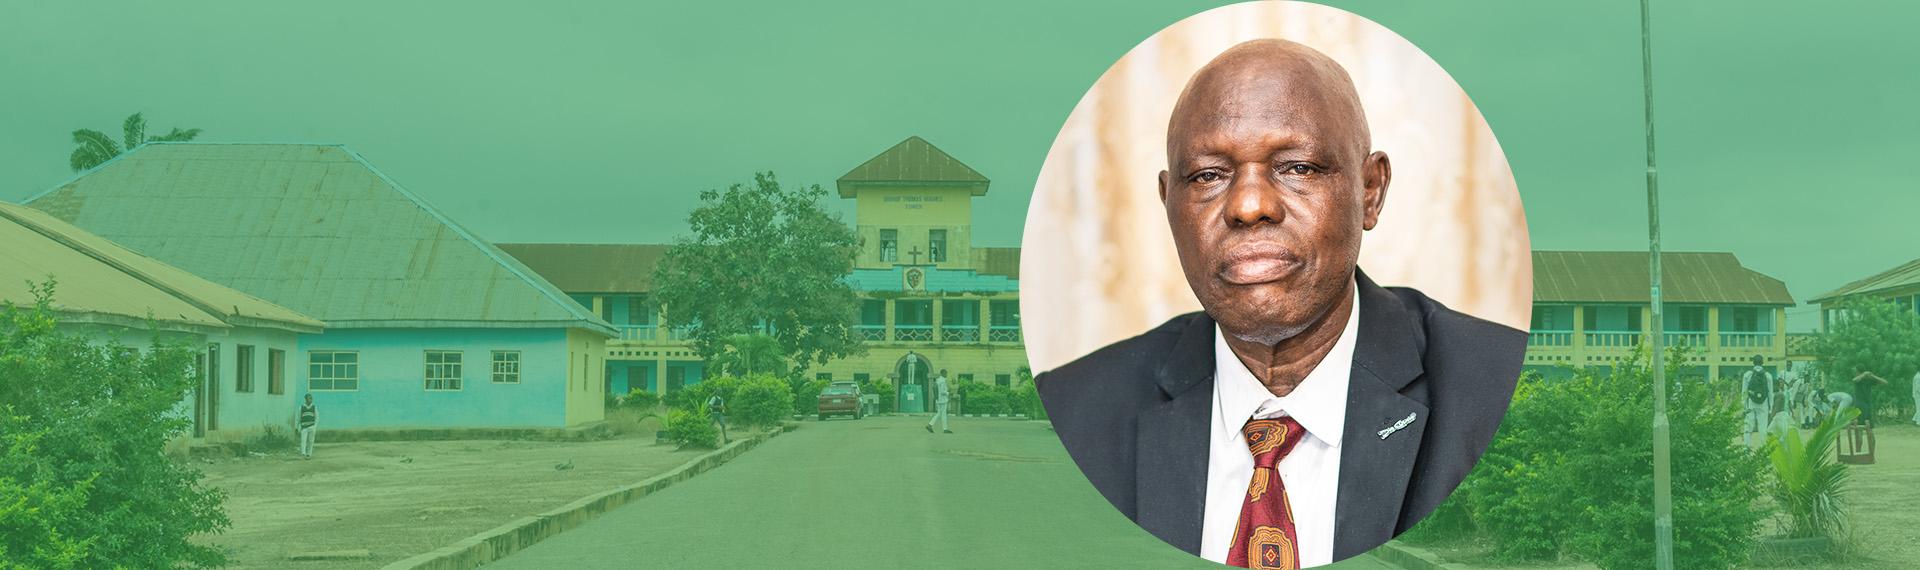 Afolabi Oni, the current (2020) ACA Principal